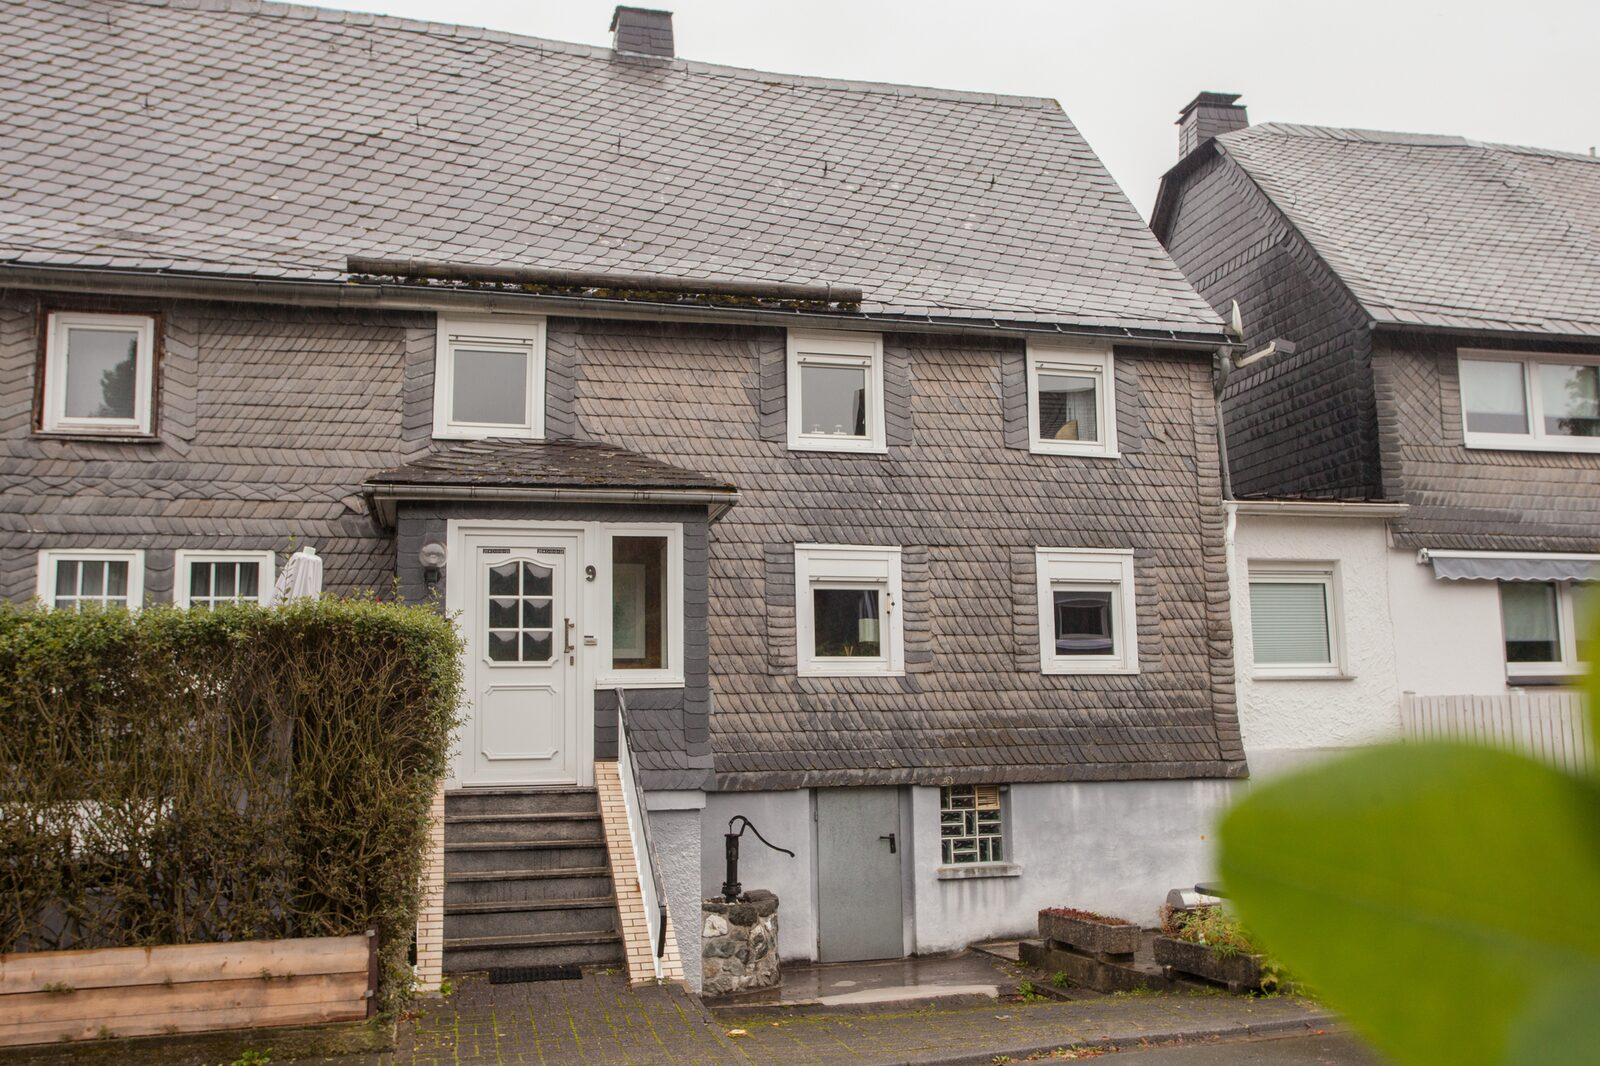 Ferienhaus - Antoniusstrasse 9   Gronebach